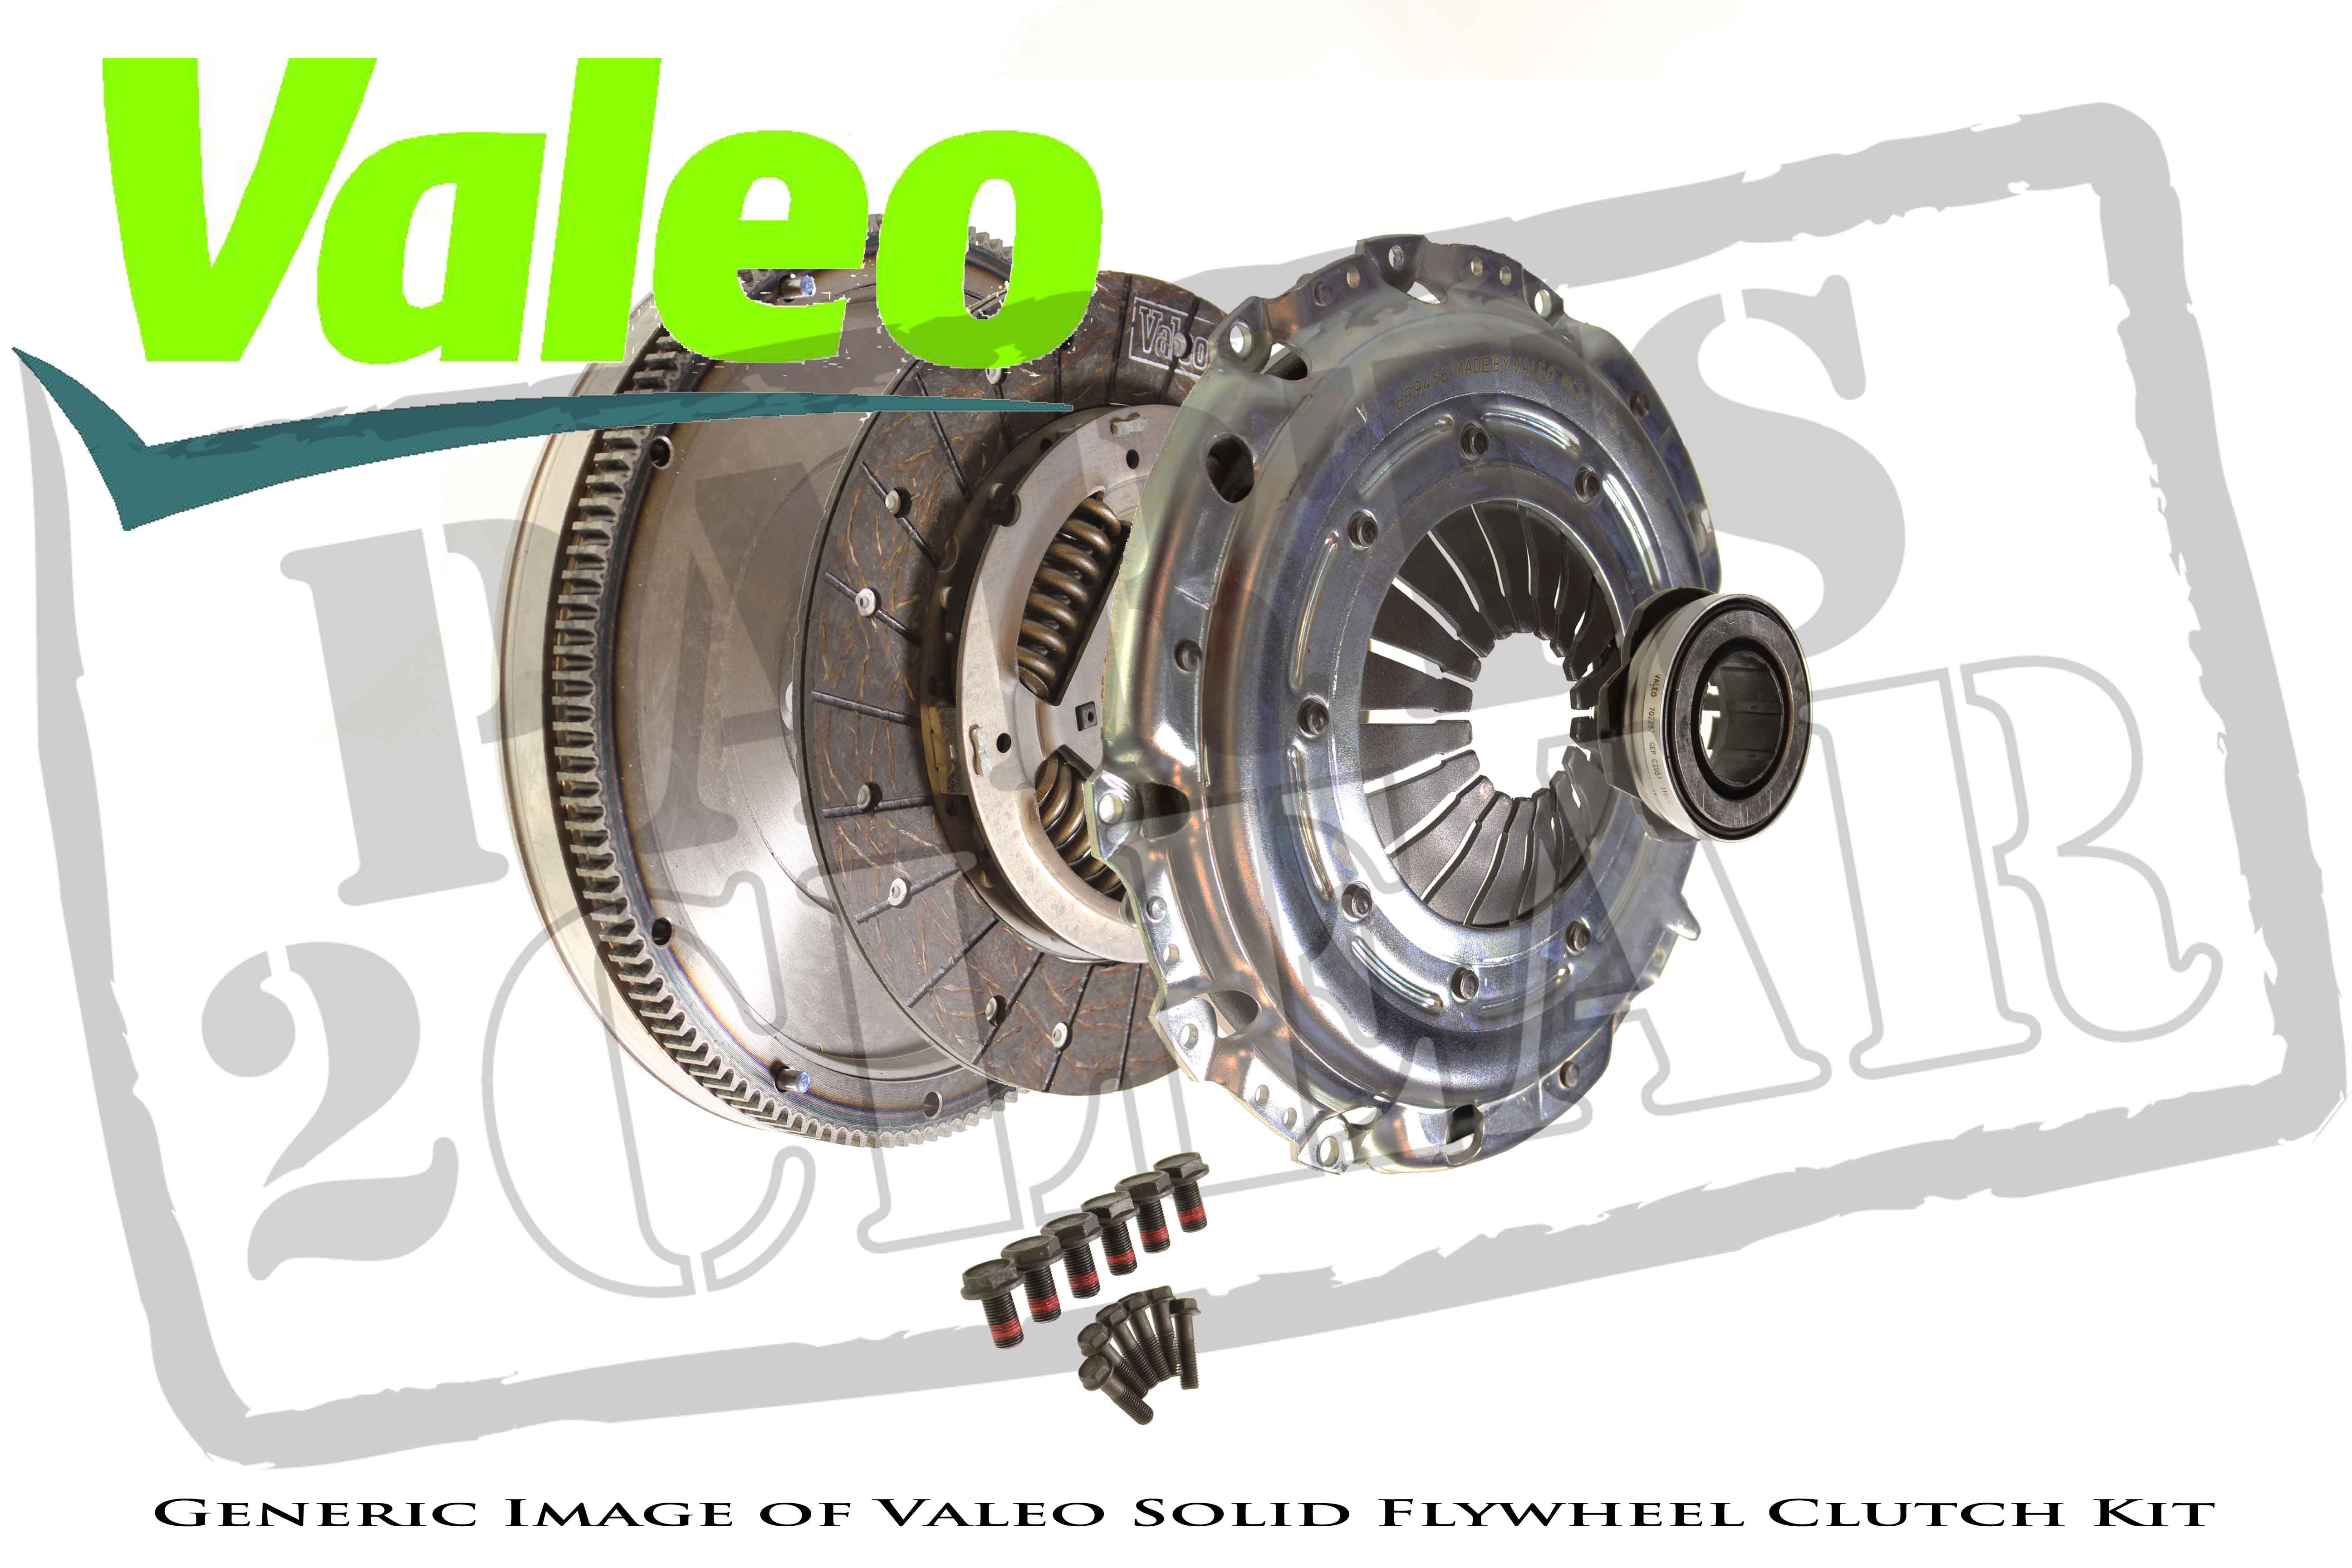 VW Transporter 2.5 Tdi T4 Solid Flywheel Clutch Kit Valeo 90 Bhp 98-03